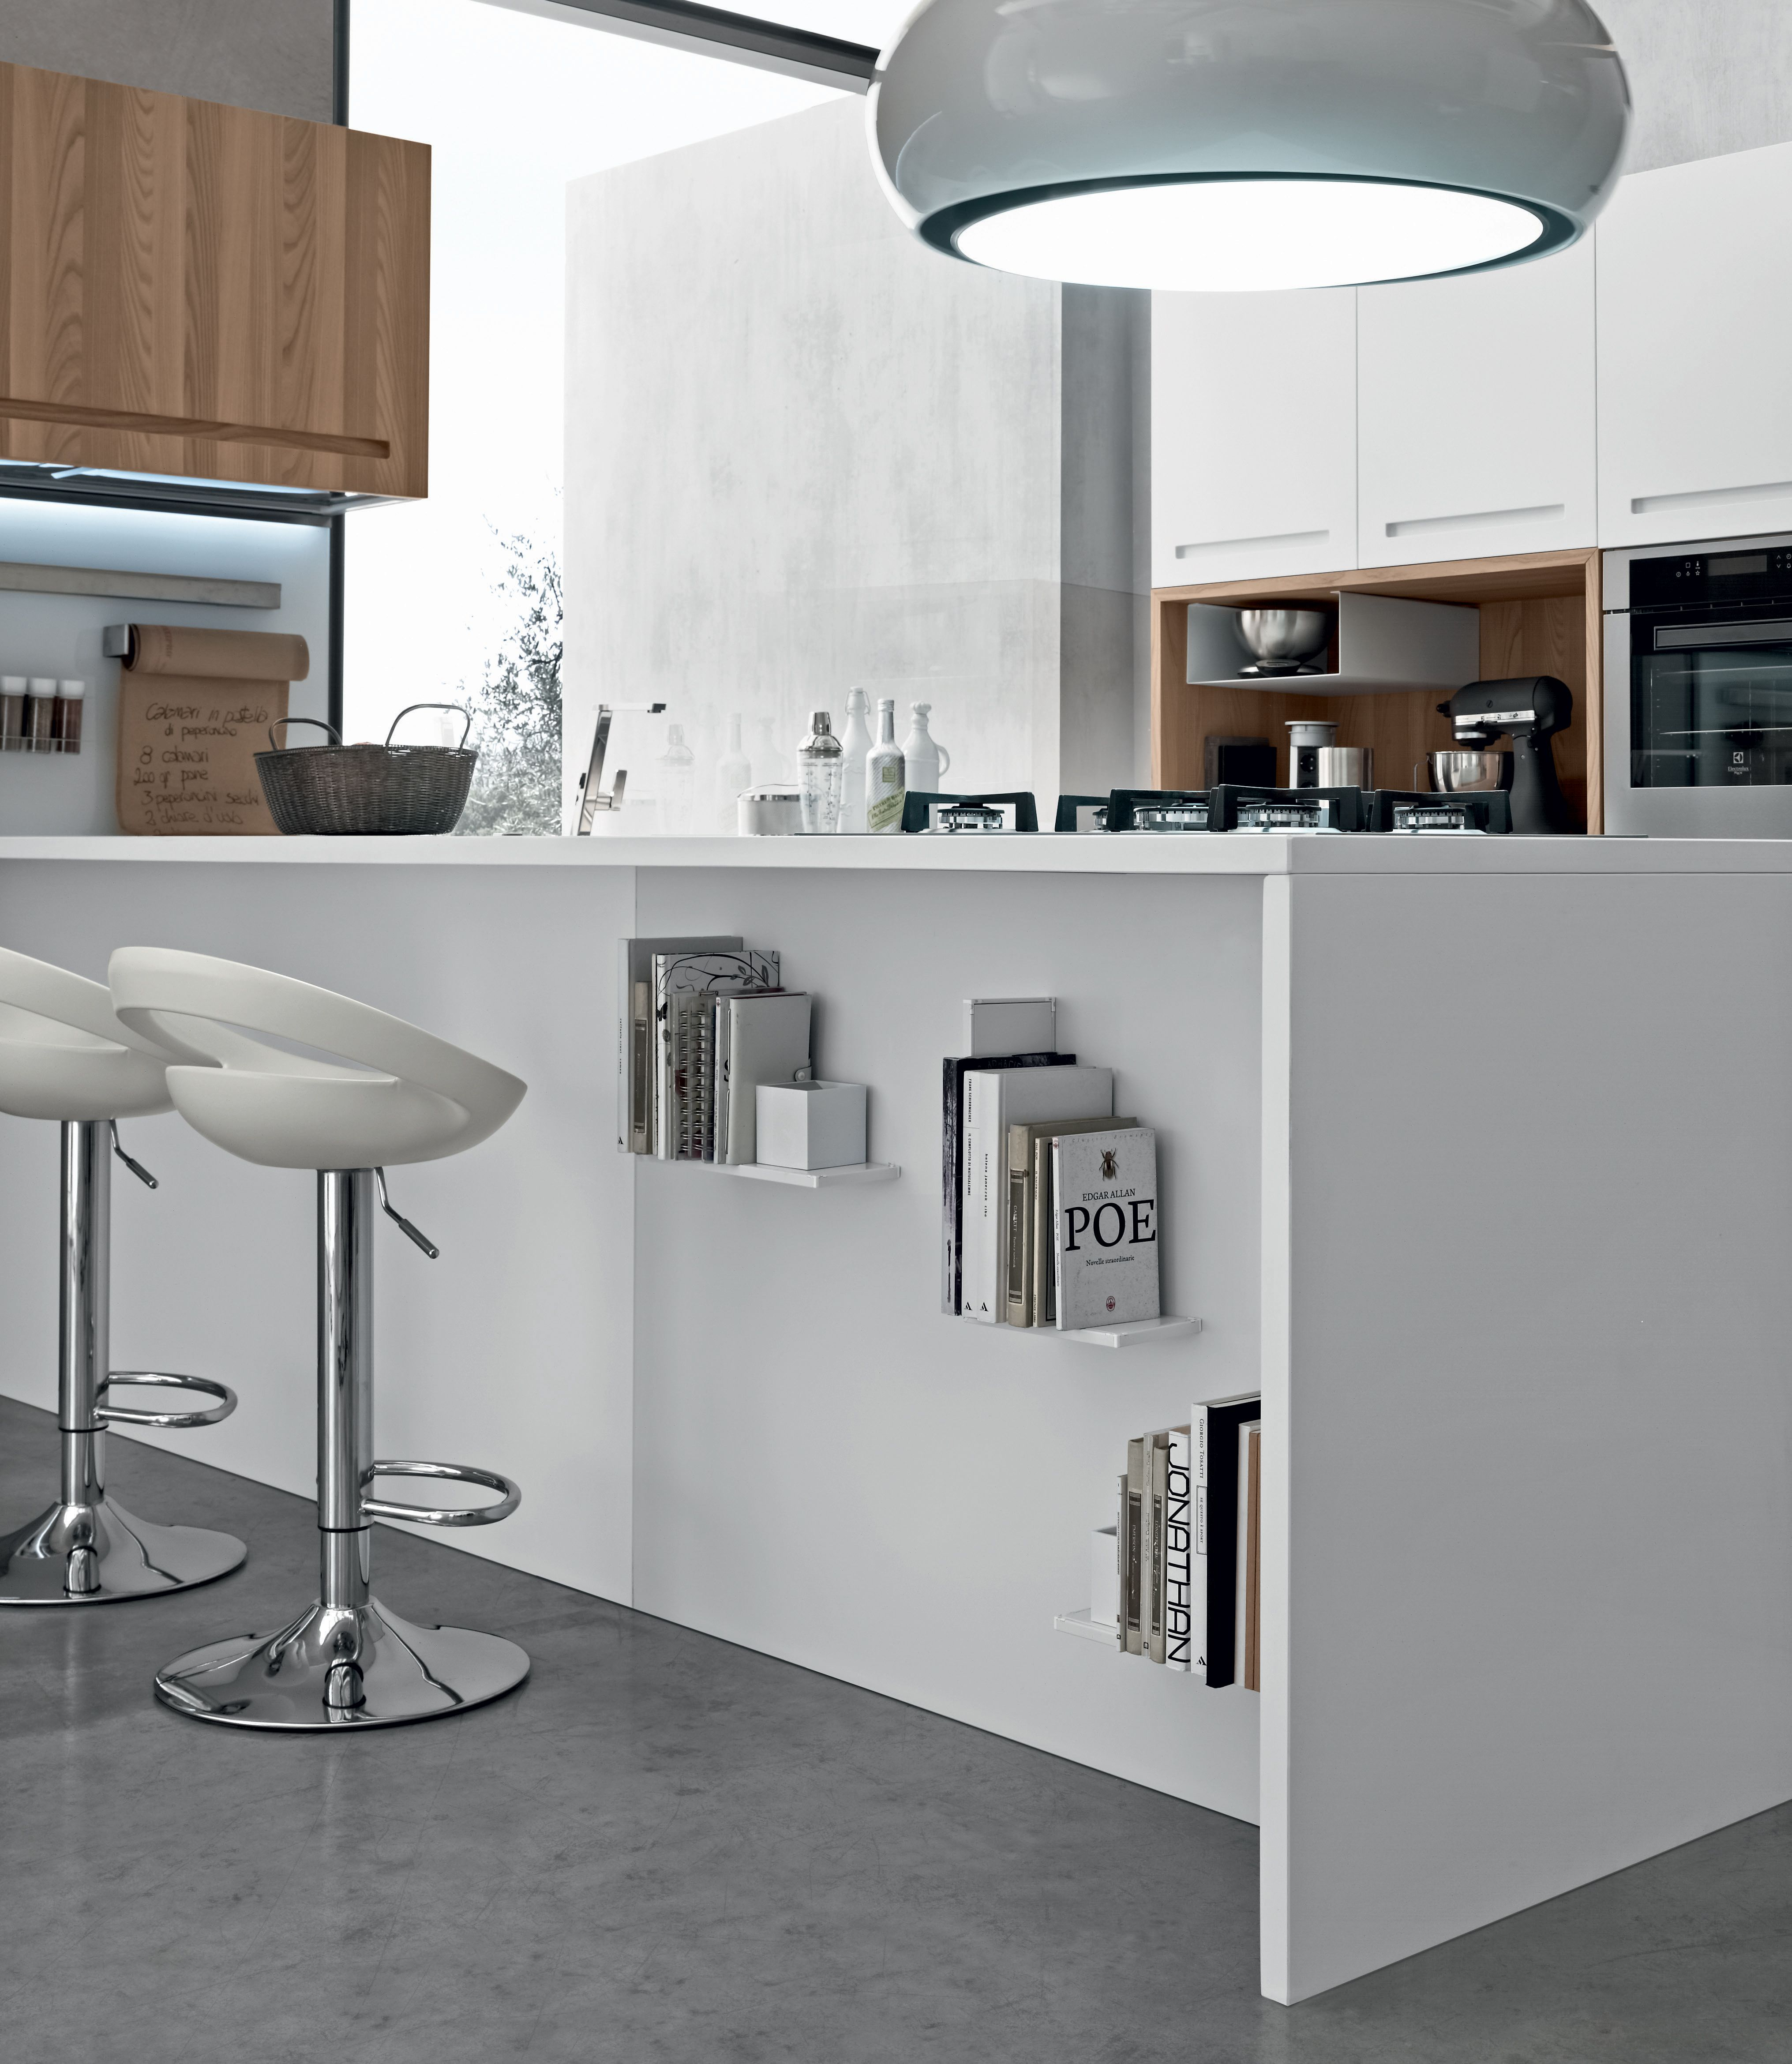 Stosa Cucine: arredamento per modelli di cucine moderne Mood ...